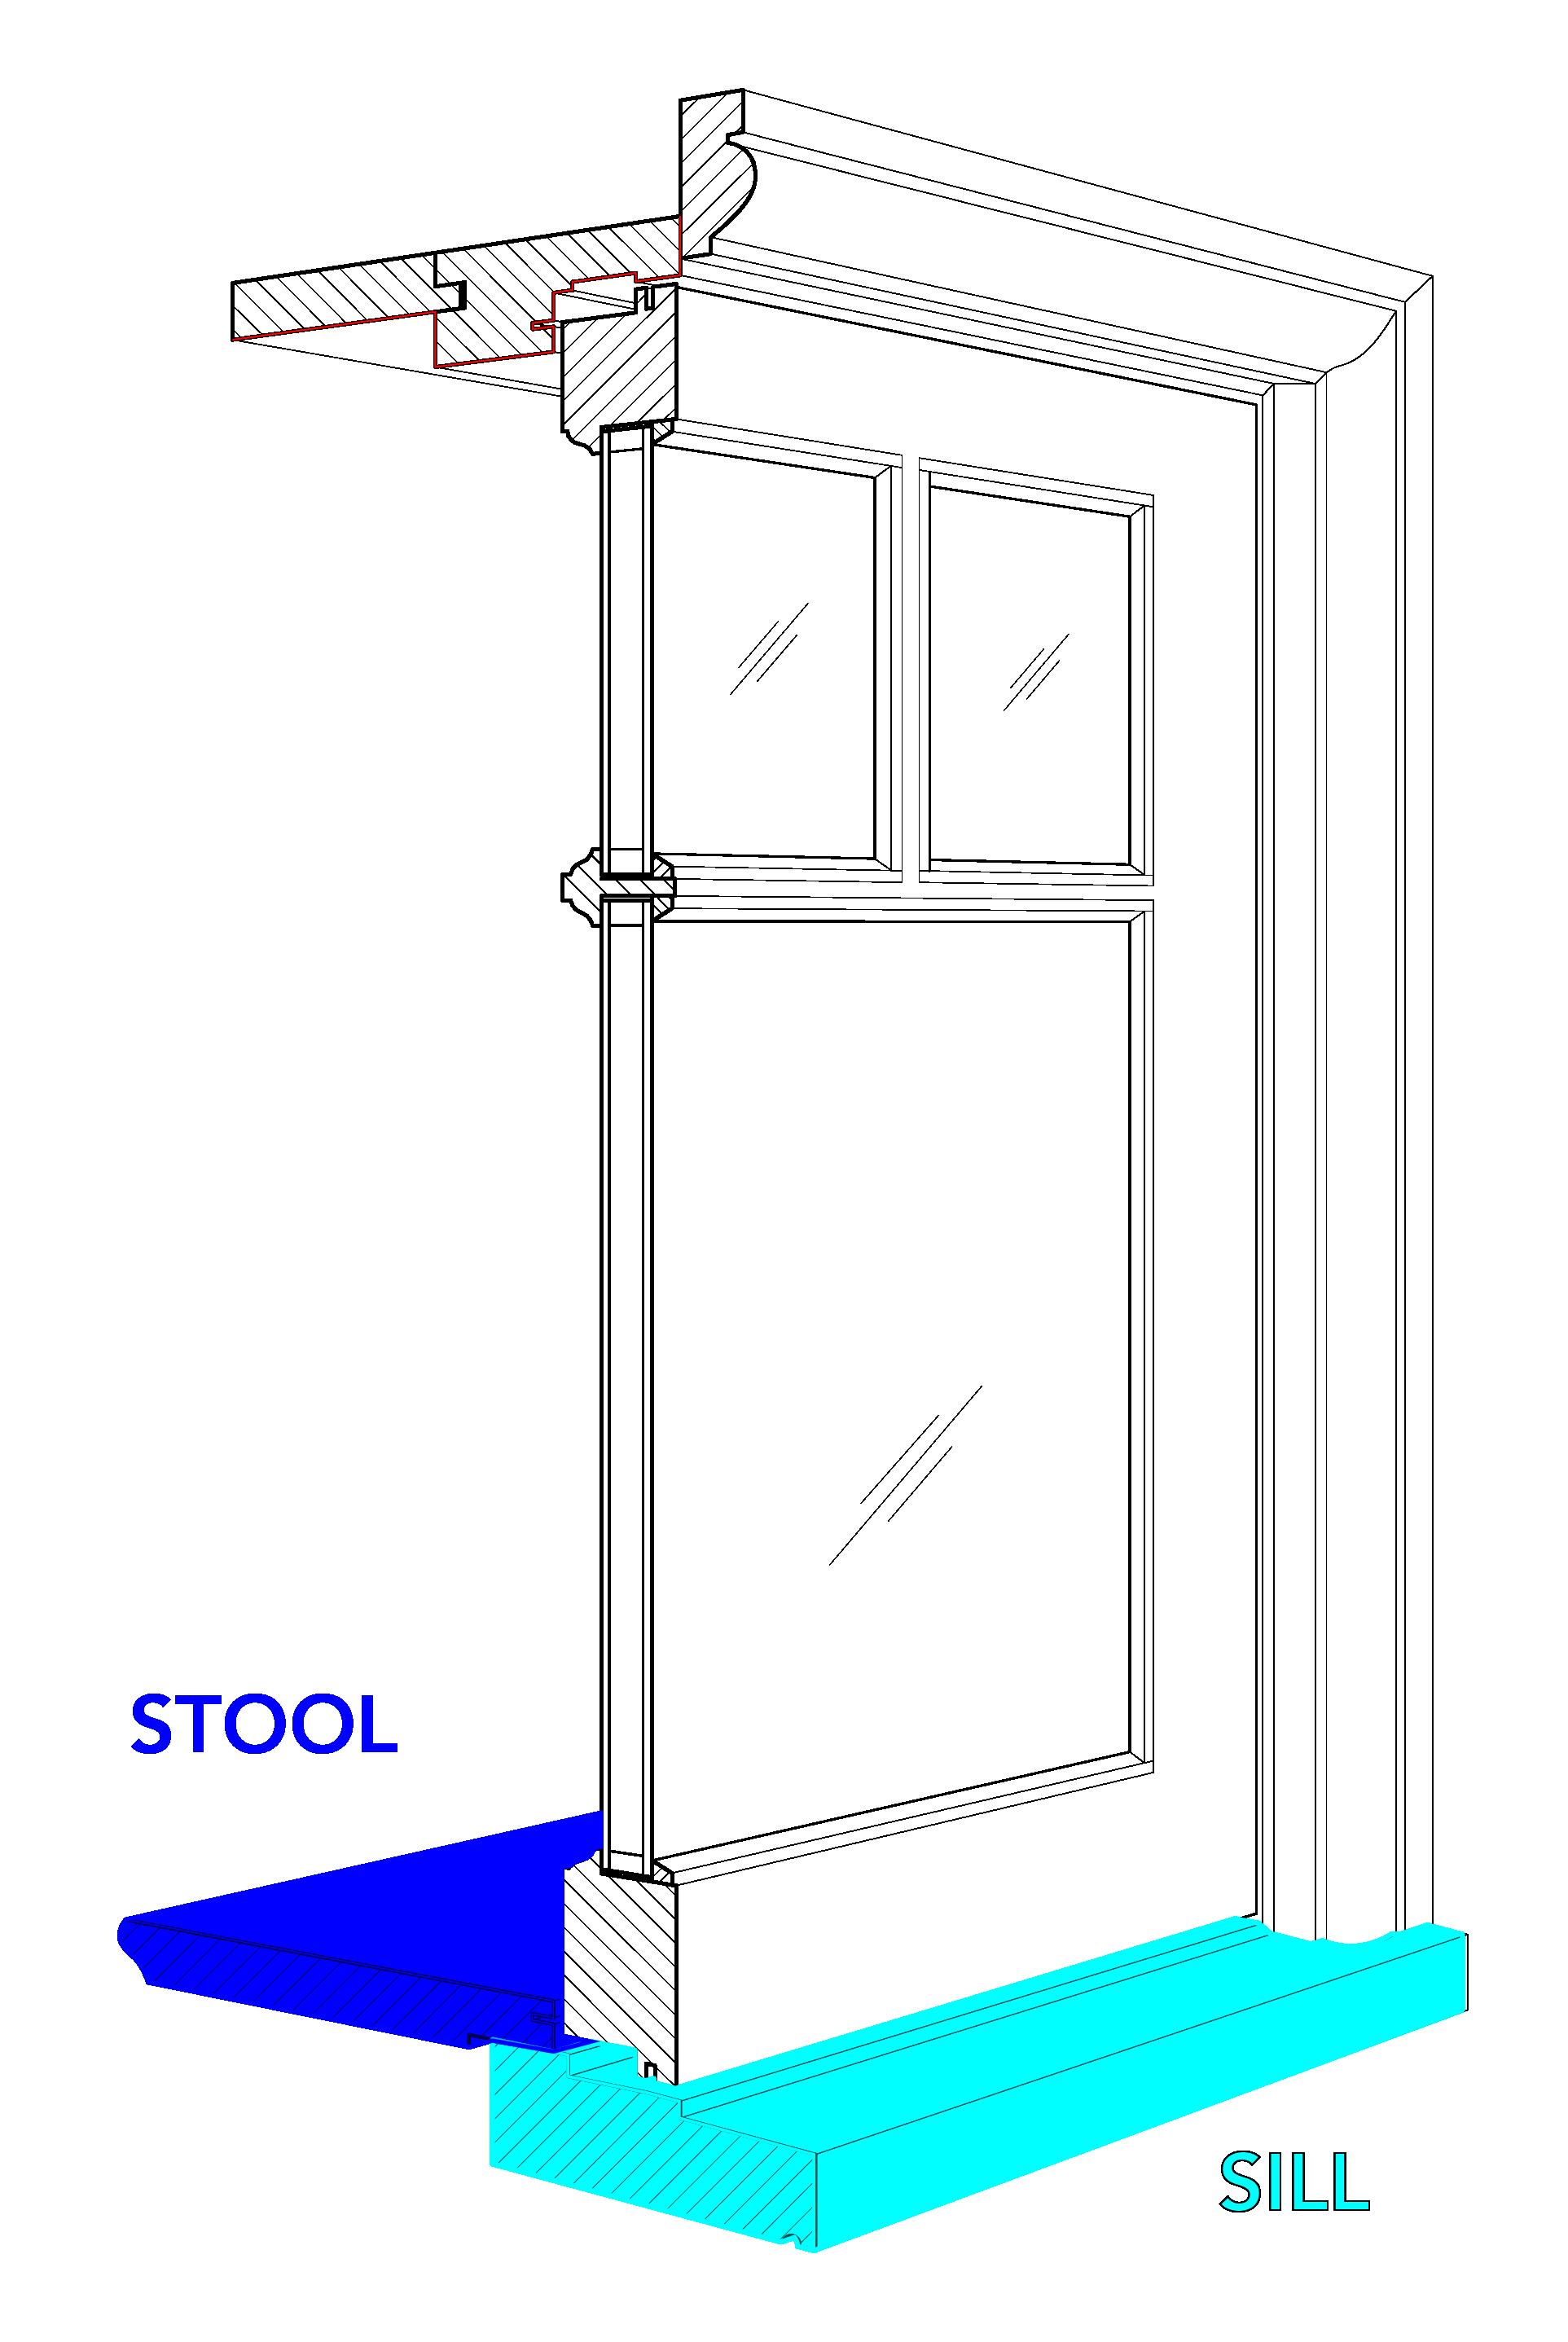 sill & stool